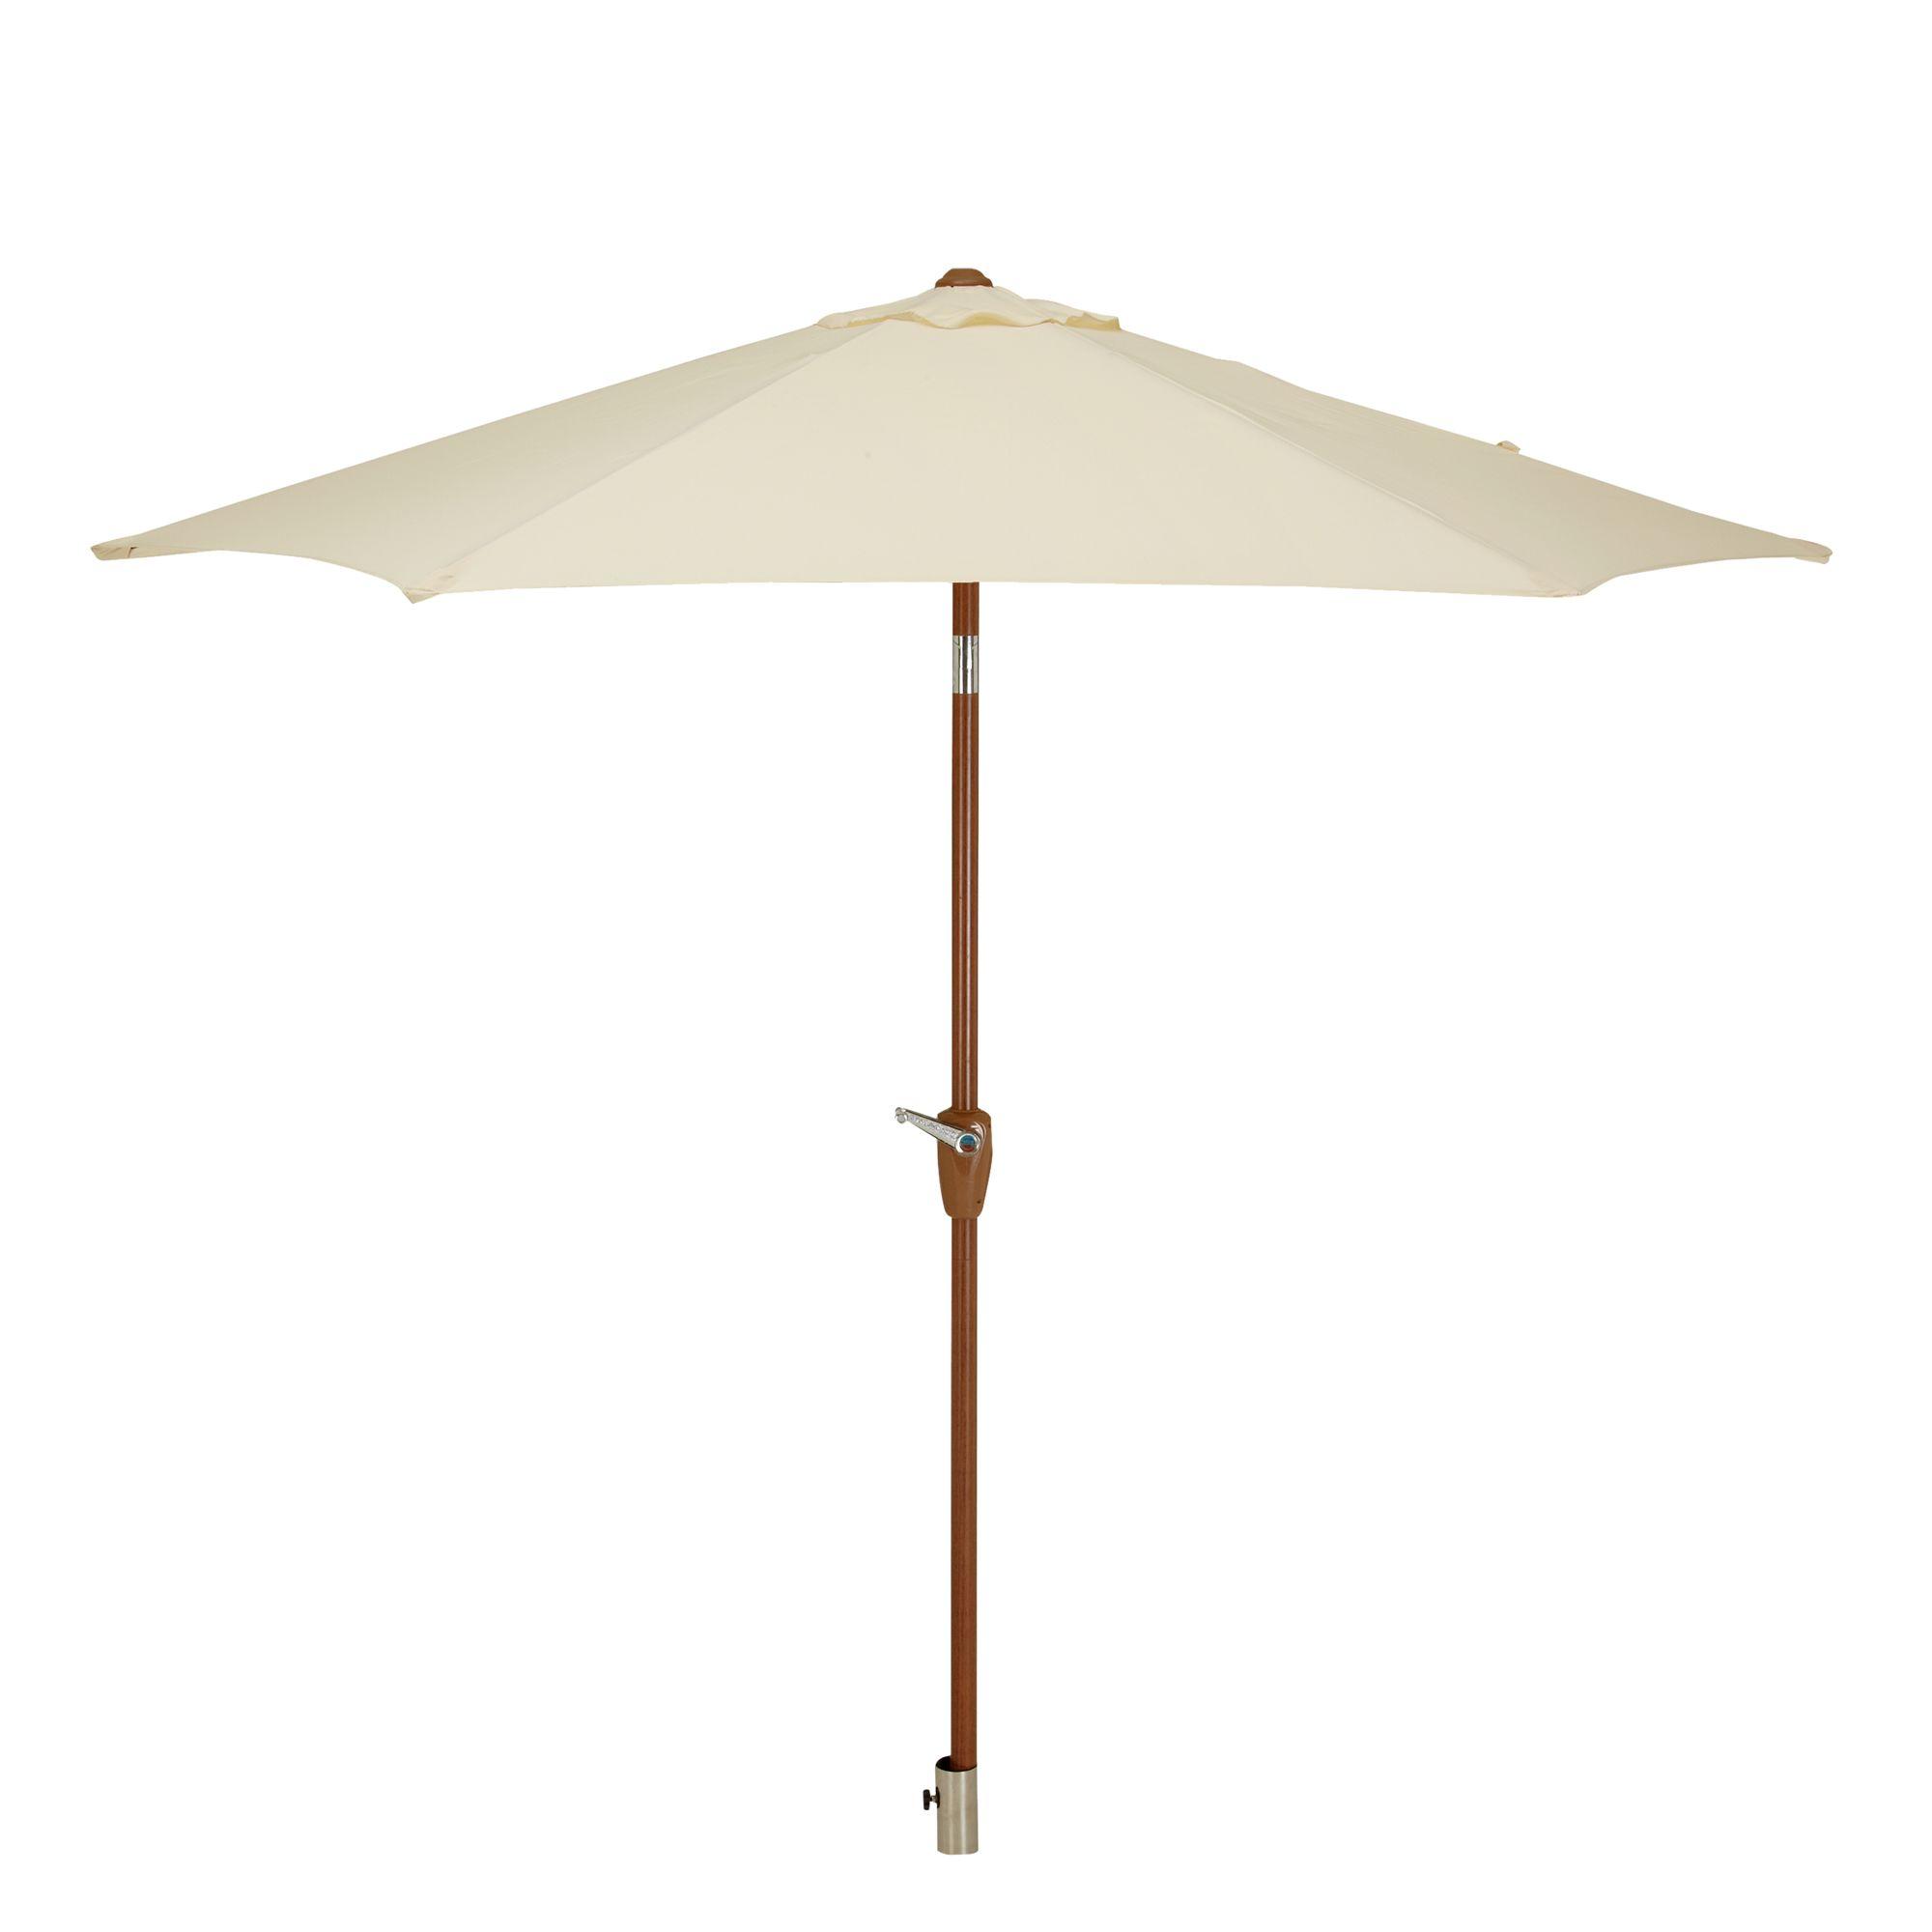 John Lewis Wood-look Parasol, 200cm